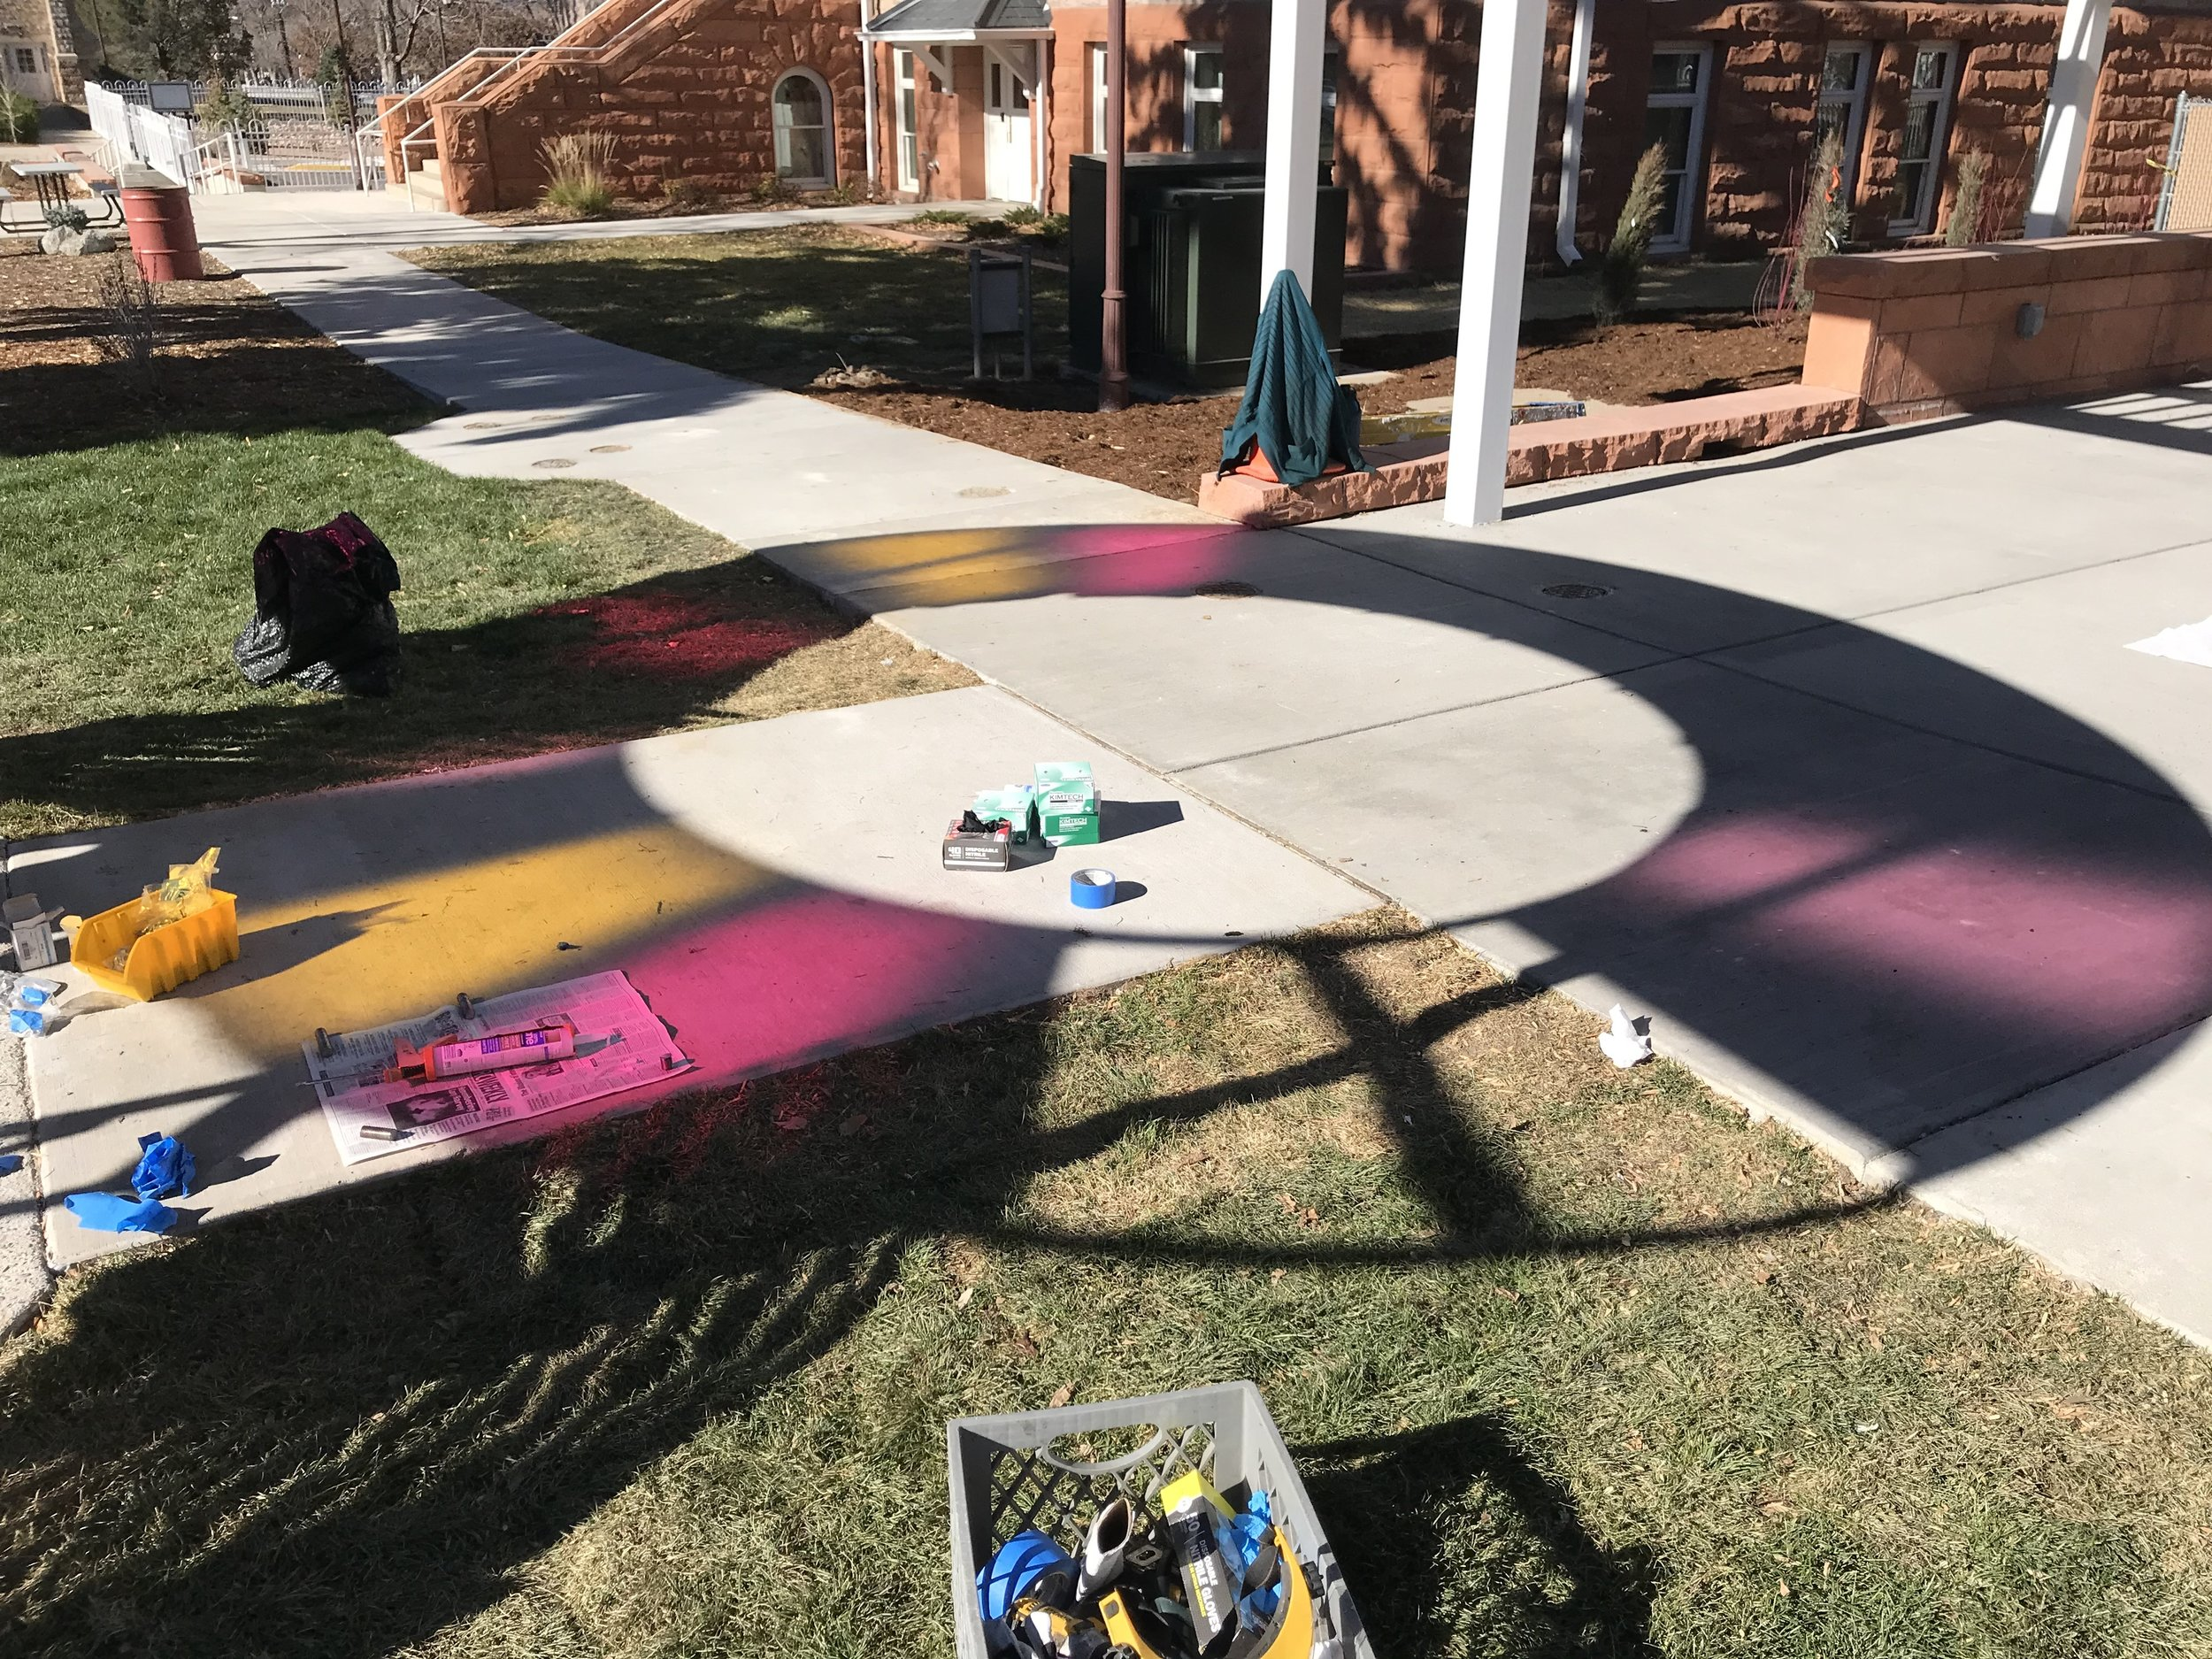 Matthew Geller_Springs_Colorado Springs_Public Art Services_J Grant Projects_12.JPEG